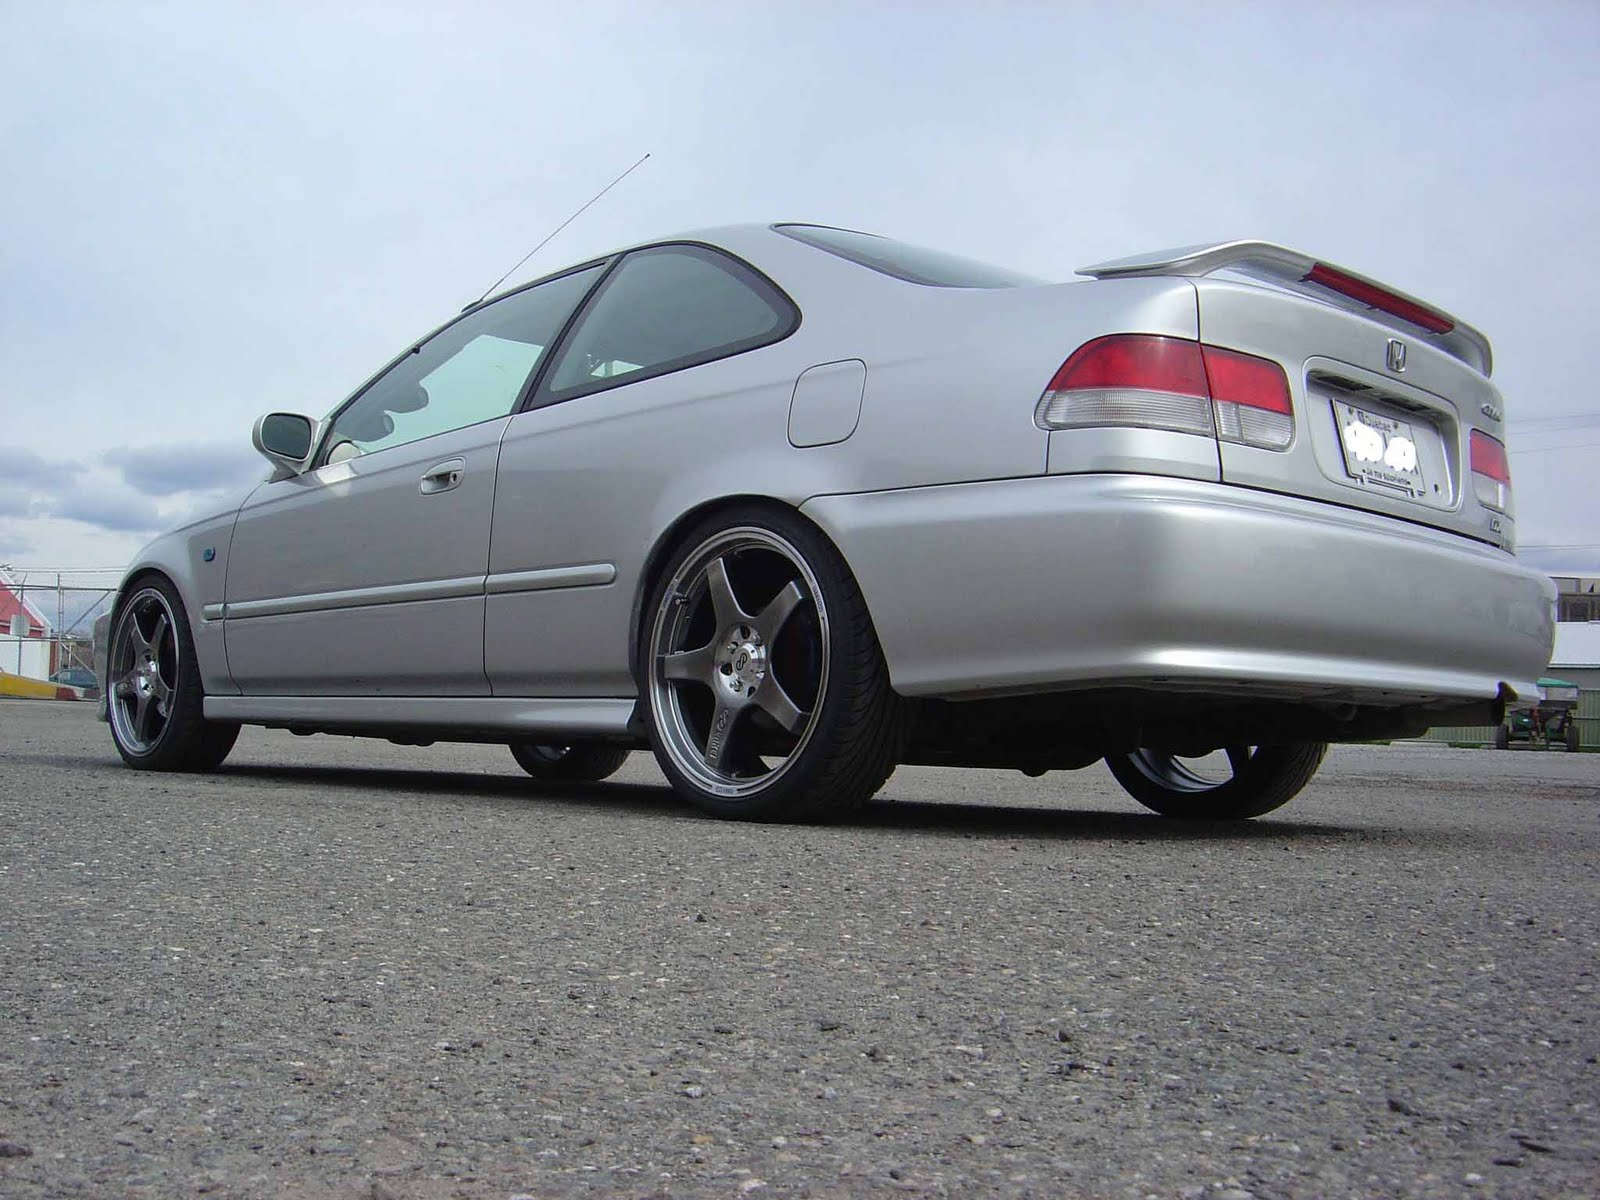 Honda Civic ex 1999